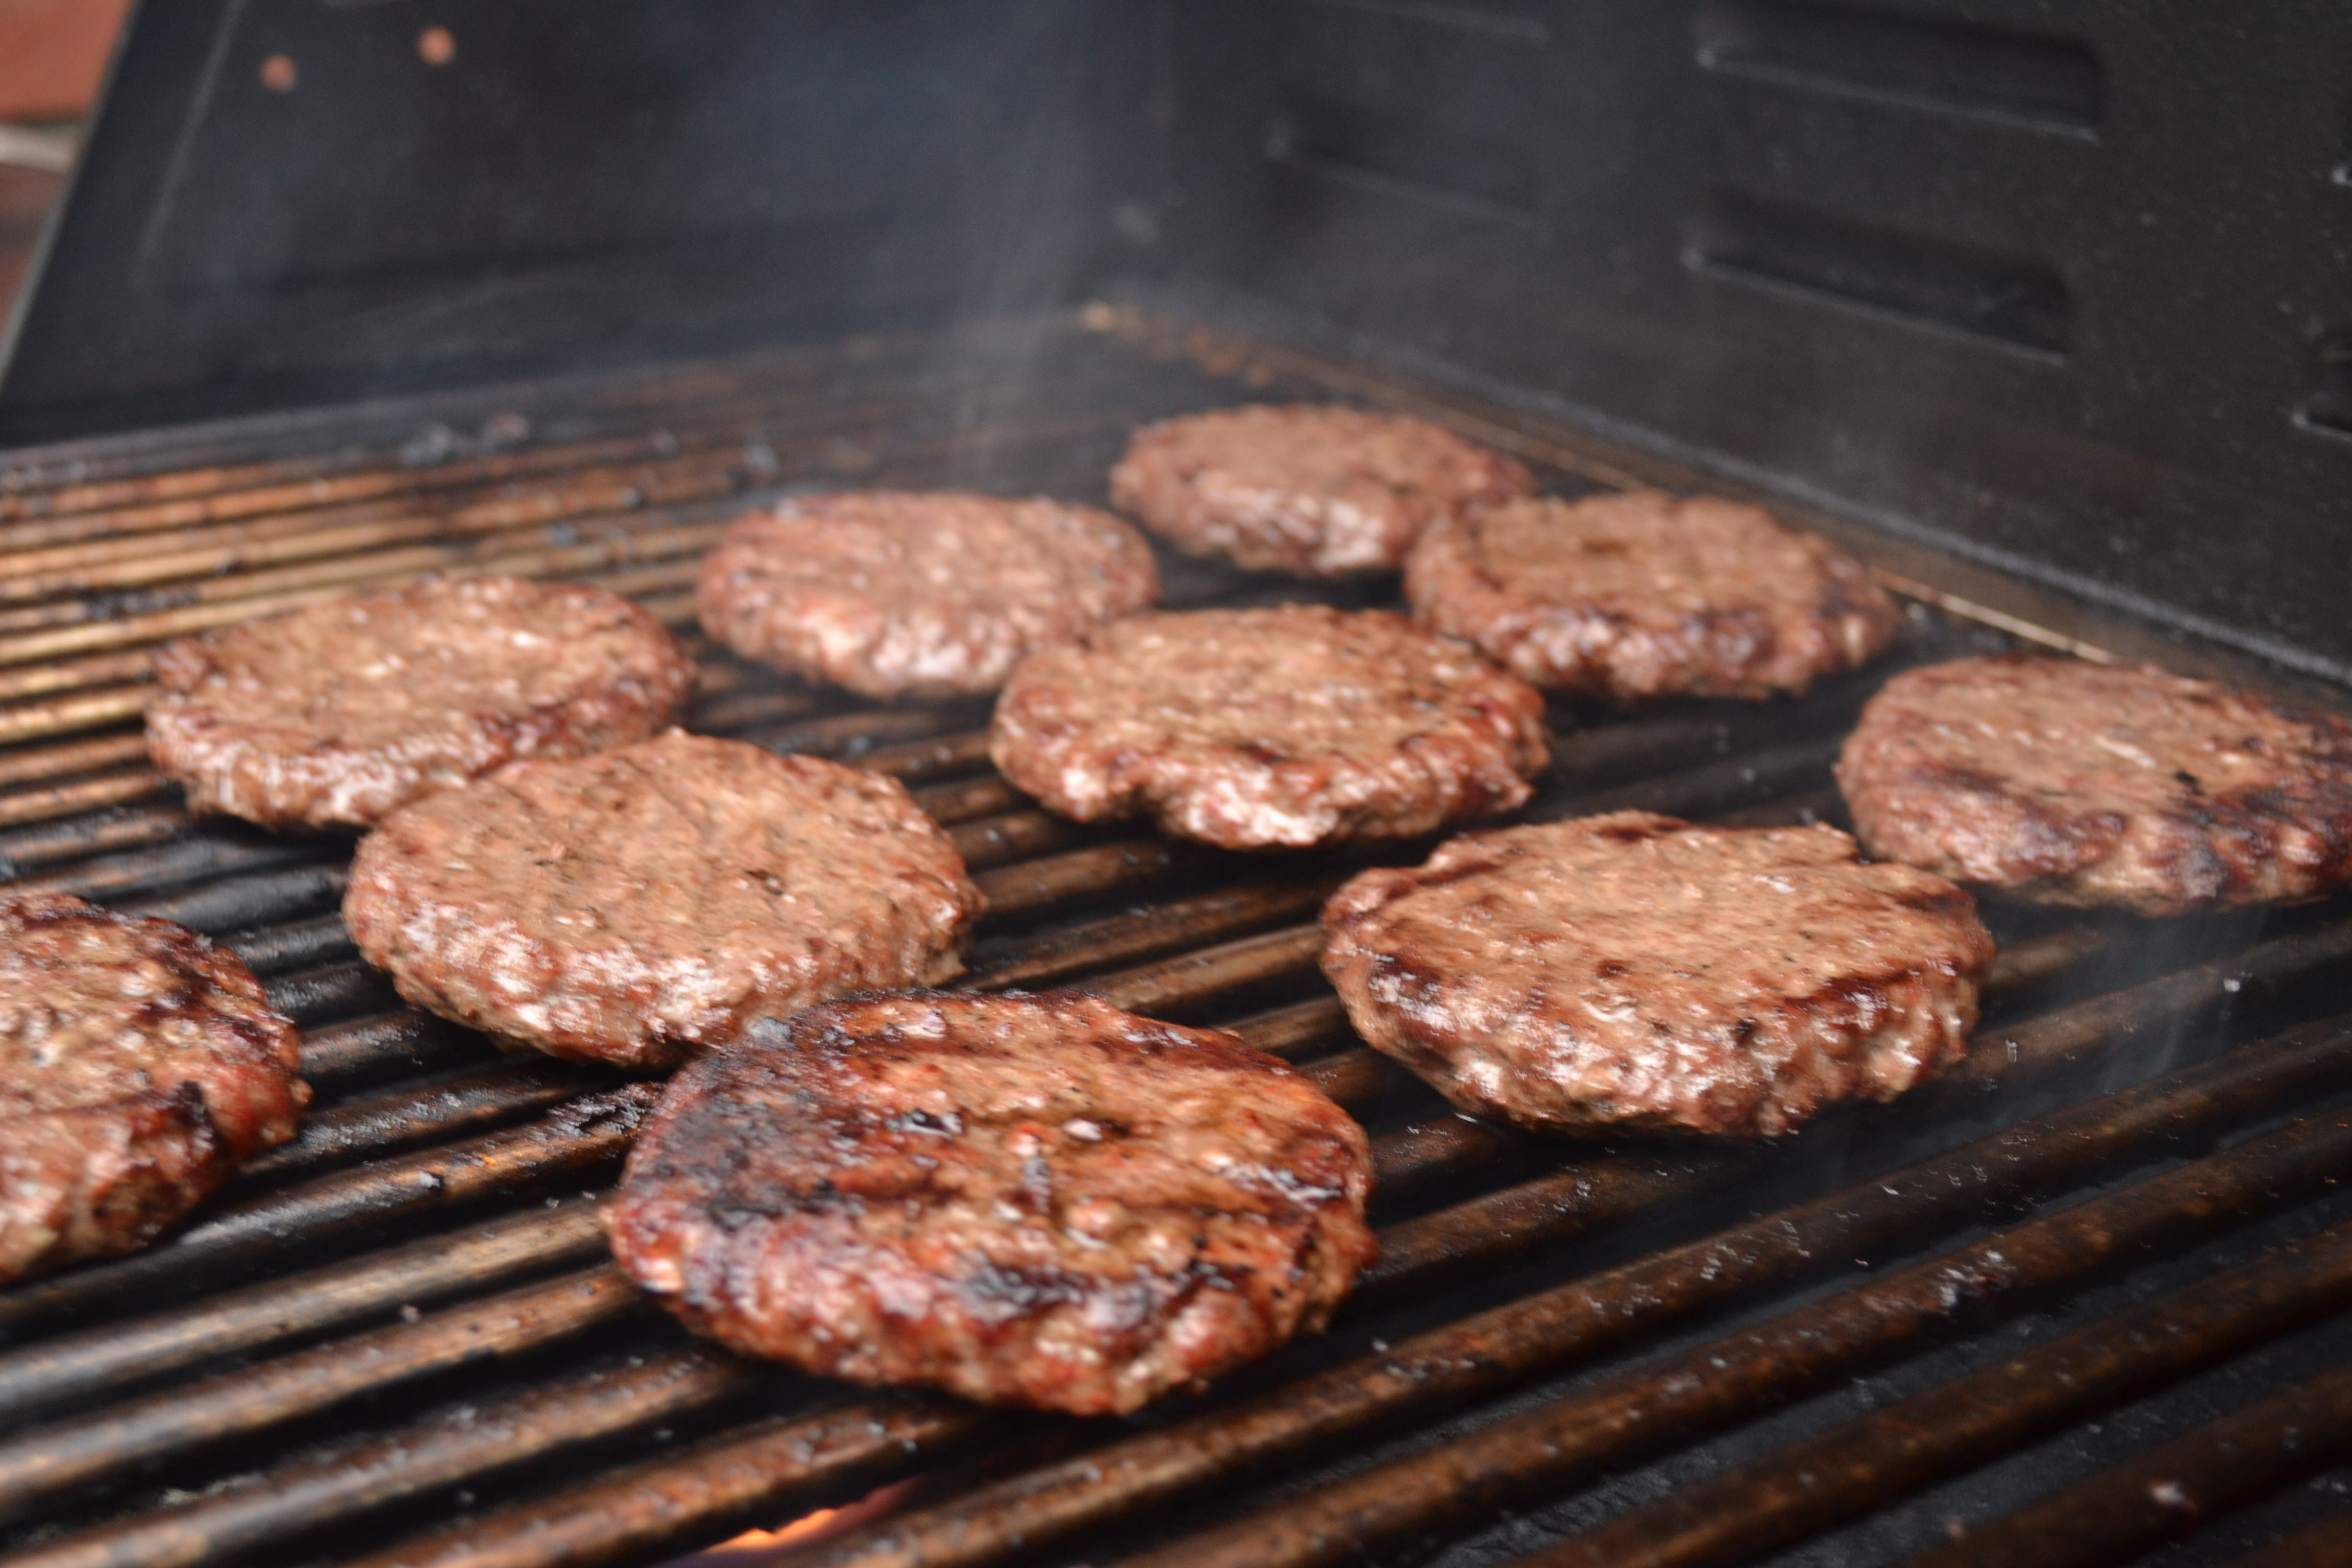 Hamburgers On The Grill  Grilled Hamburgers